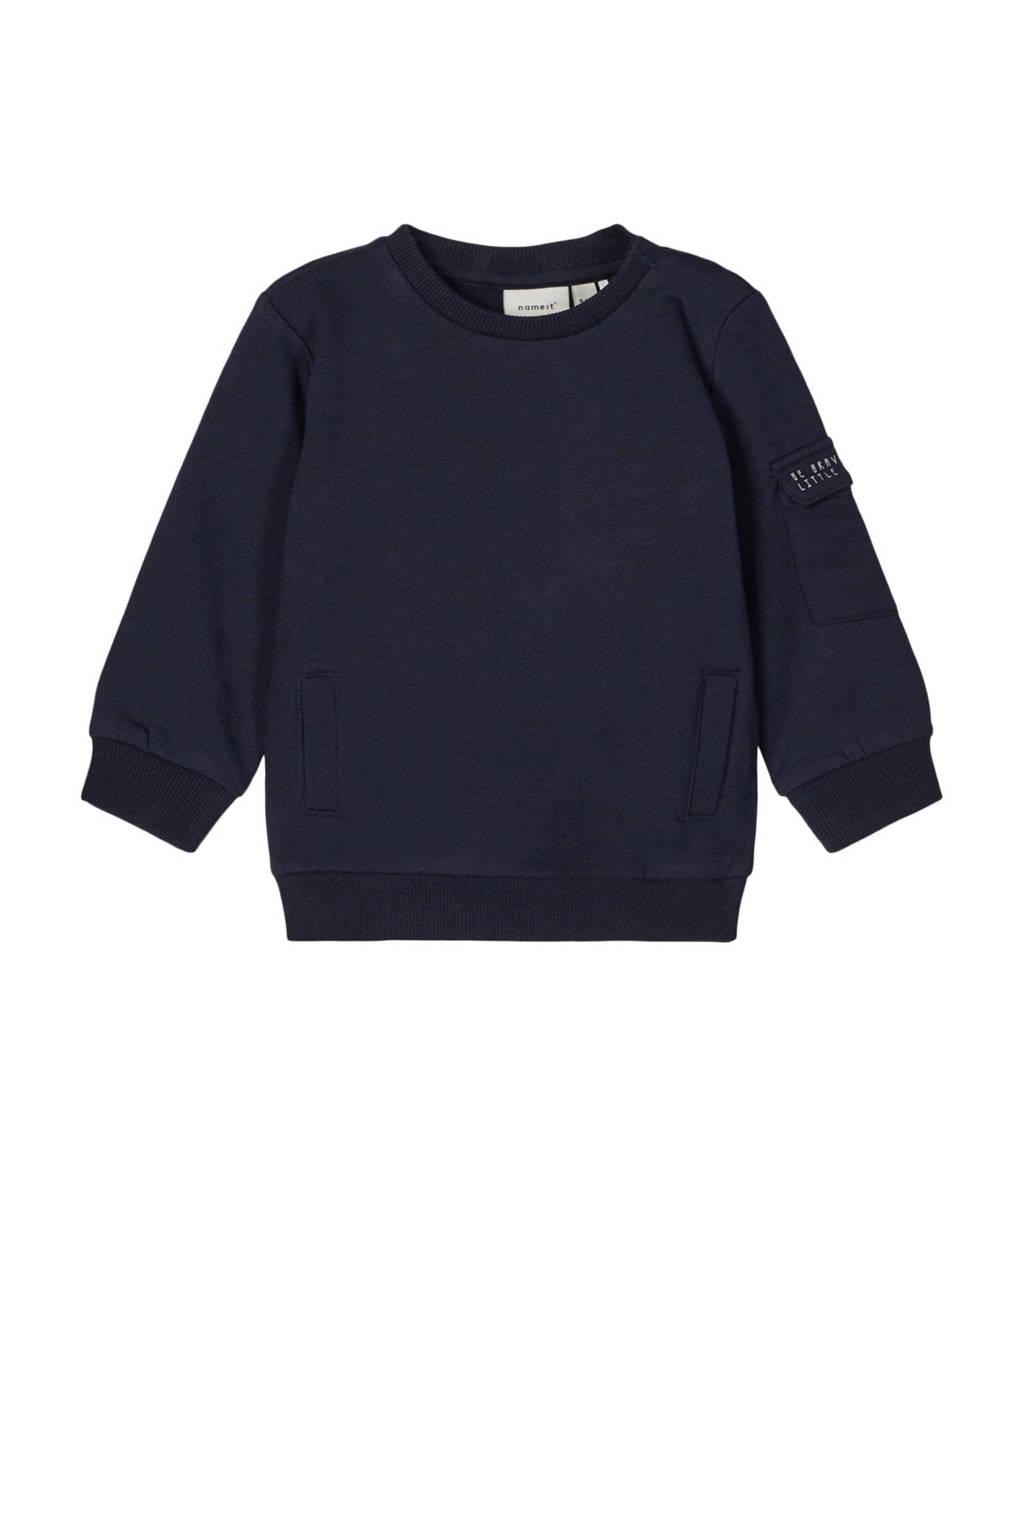 NAME IT BABY baby sweater Ones donkerblauw, Donkerblauw